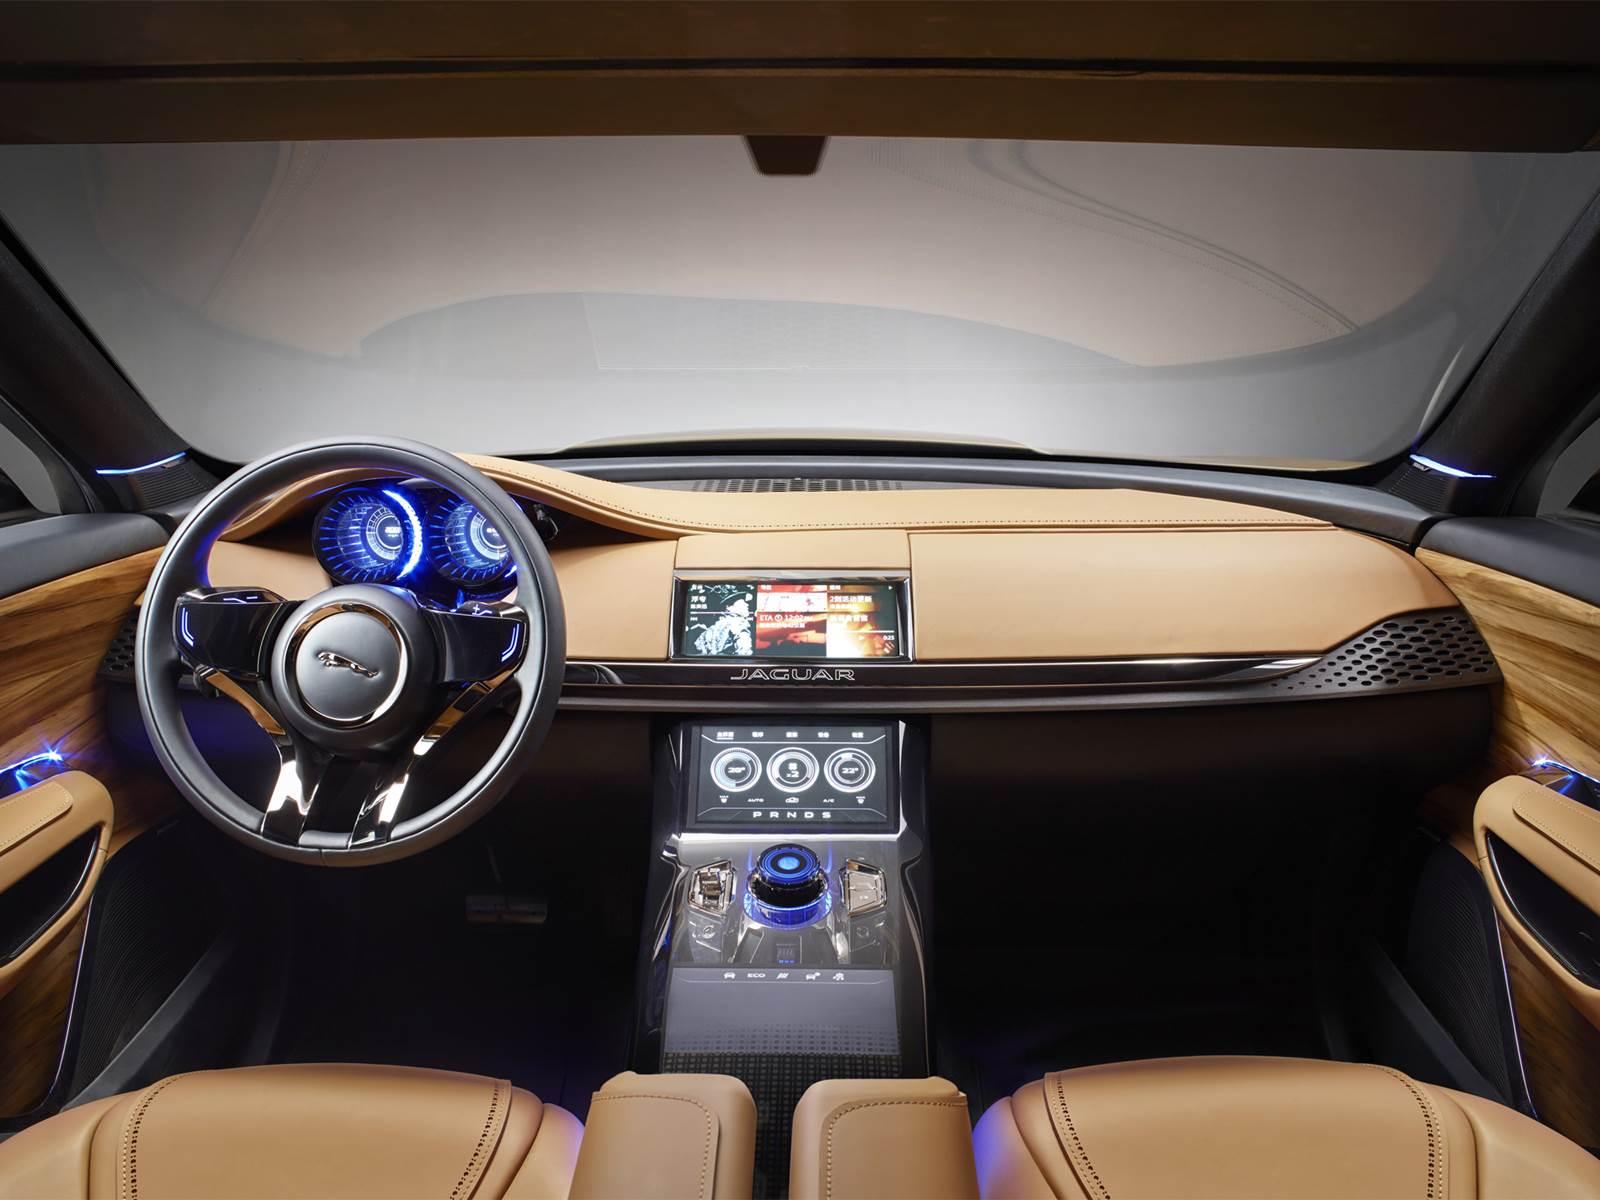 Jaguar f pace suv chega em 2016 para encarar o bmw x3 for Interieur jaguar f pace